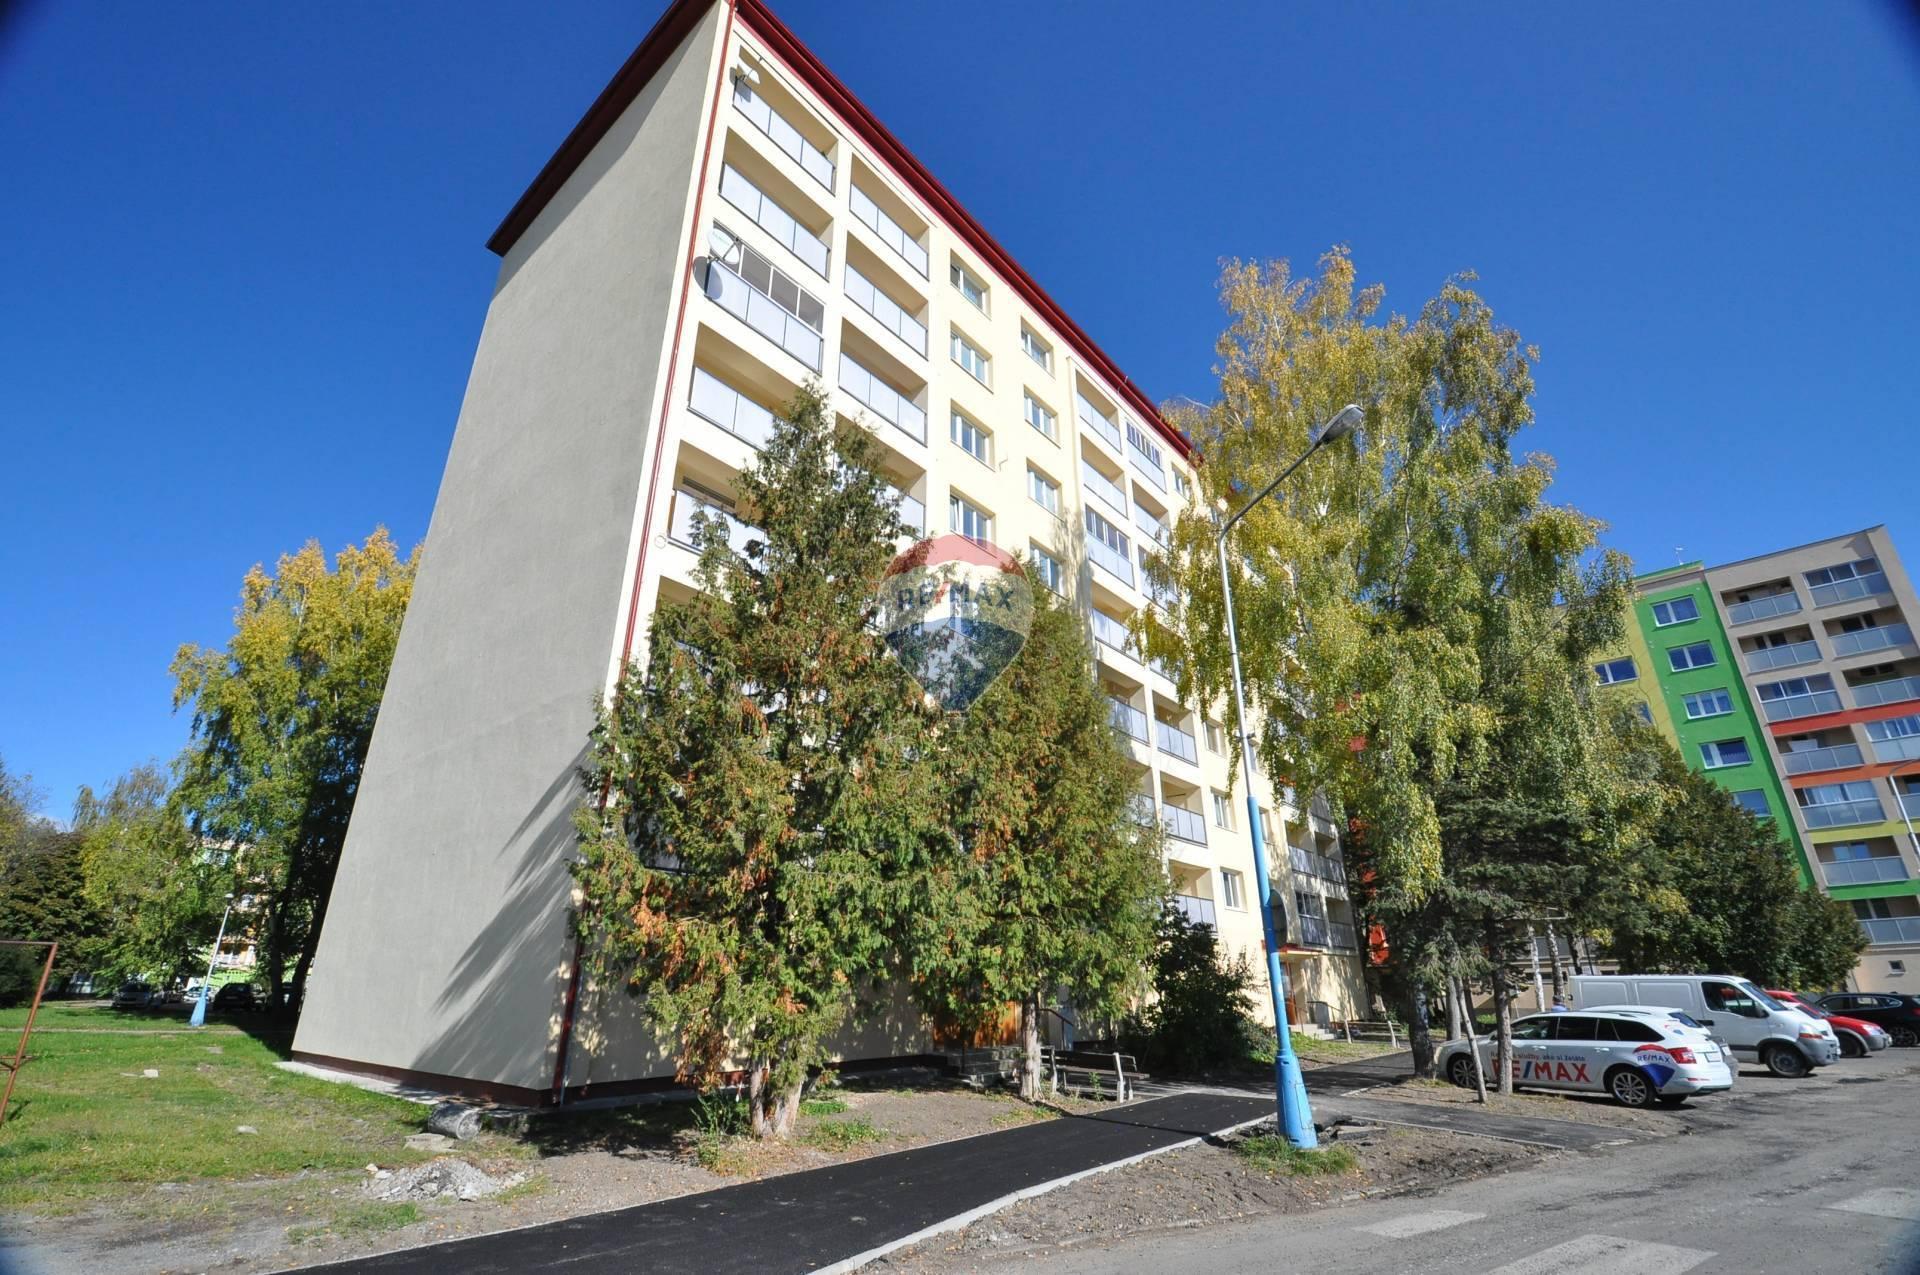 PREDAJ, 2-izbový byt, Poprad, Ul. 29. augusta,